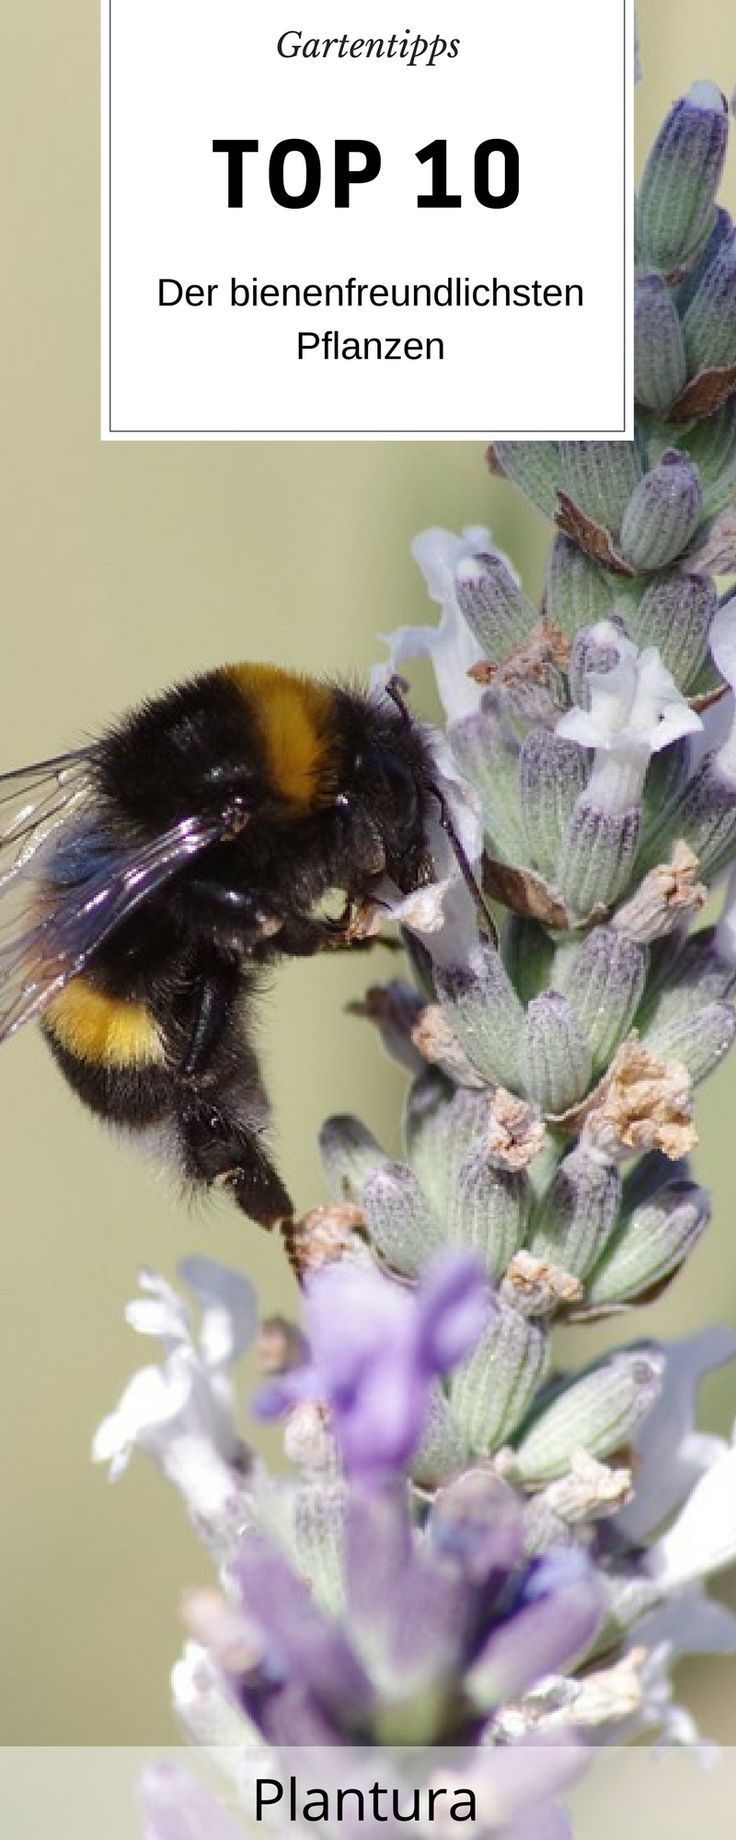 Bee Hair Bienenprodukte Bienen Bienenhaltung